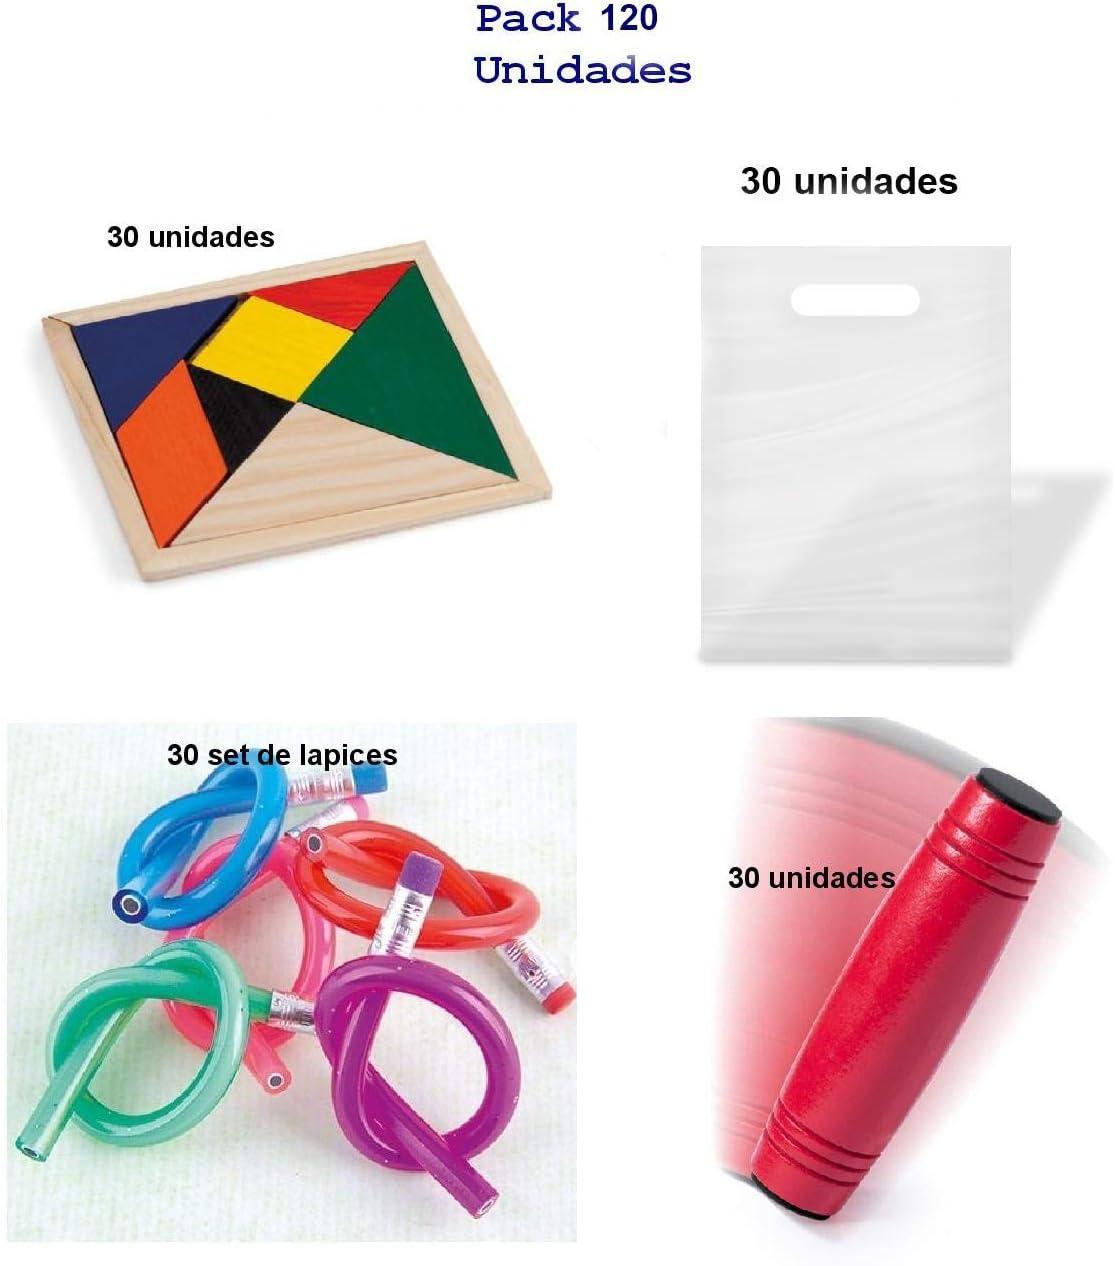 Divertido pack de detalles infantiles 30 juegos habilidades rondux ...